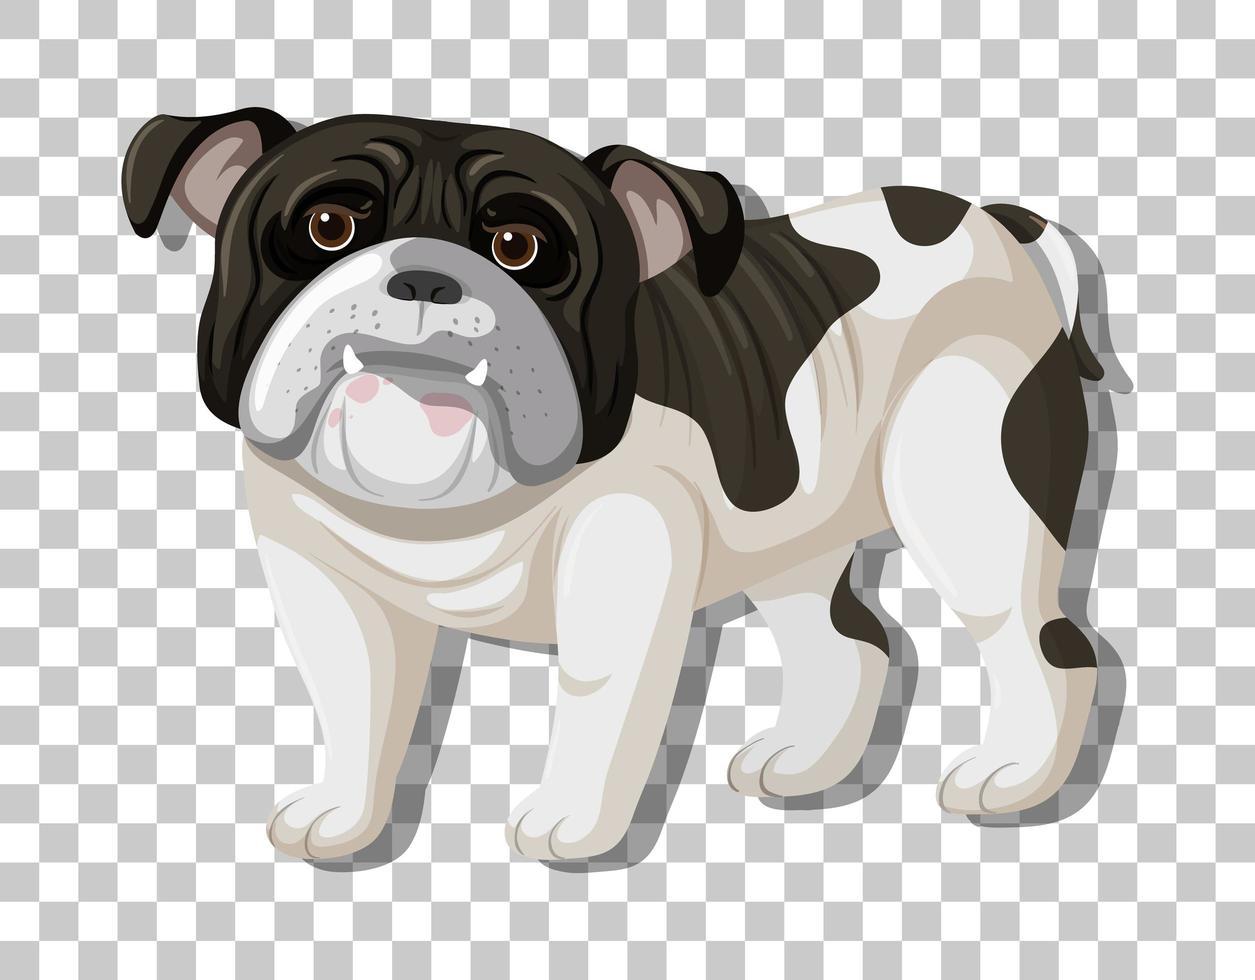 Bulldog blanco negro en caricatura de posición de pie vector